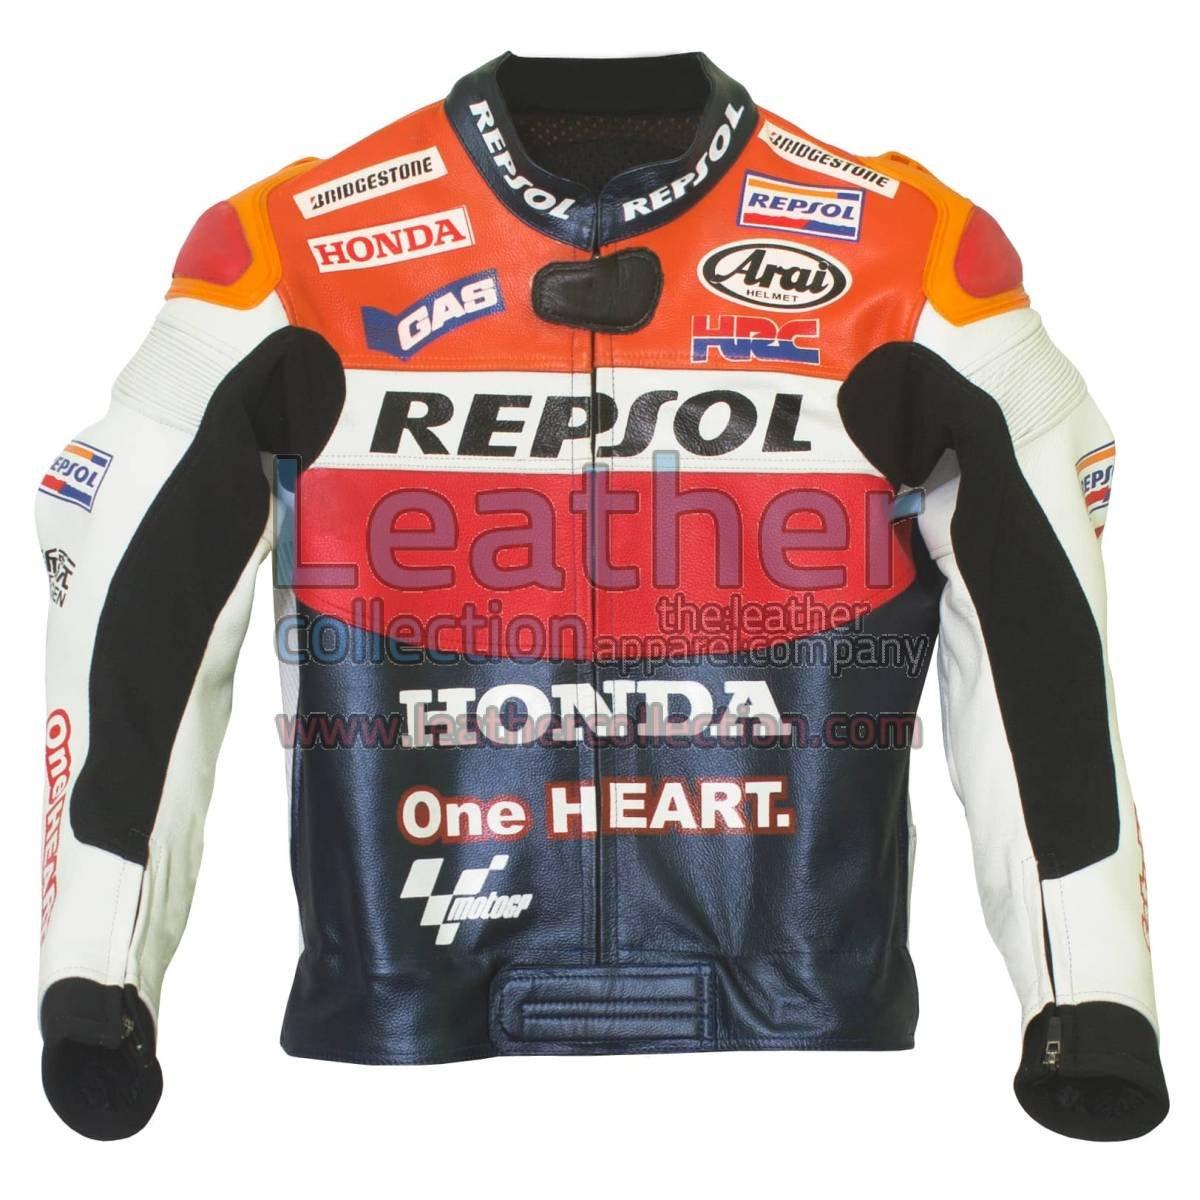 Dani Pedrosa 2012 Honda Repsol One Heart Race Jacket